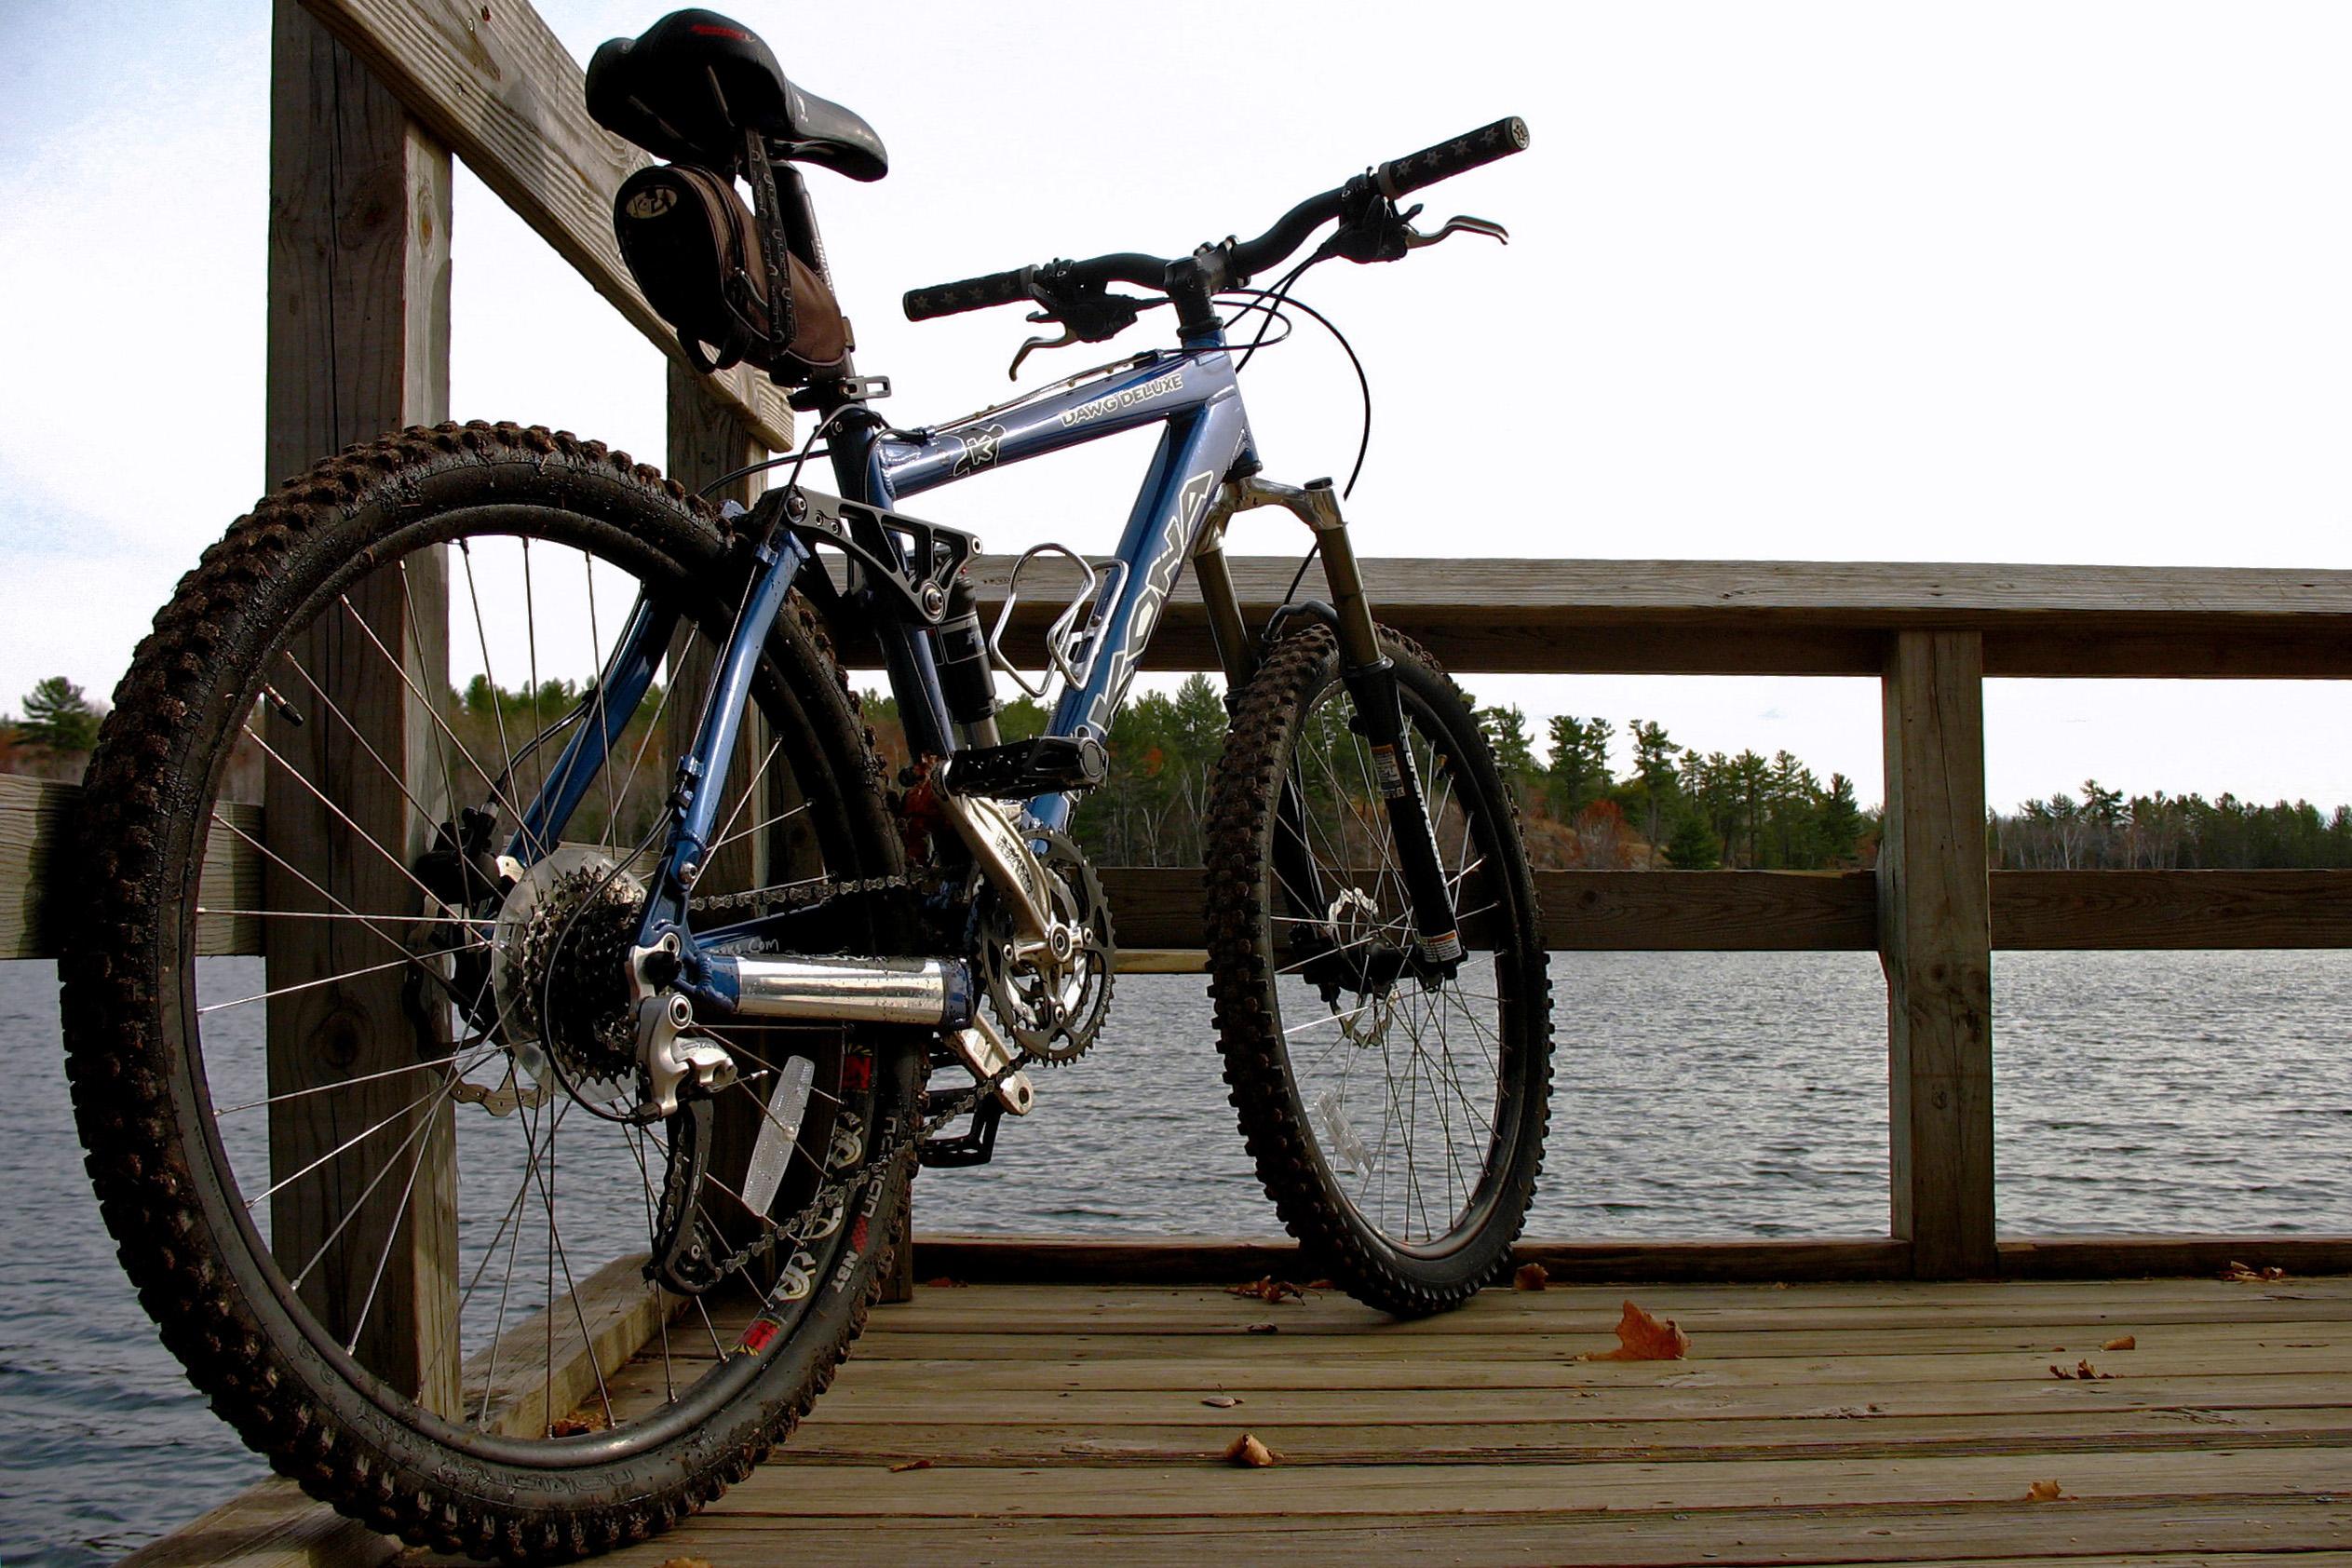 Kona Closeup, Bicycle, Bike, Bspo06, Mountainbike, HQ Photo